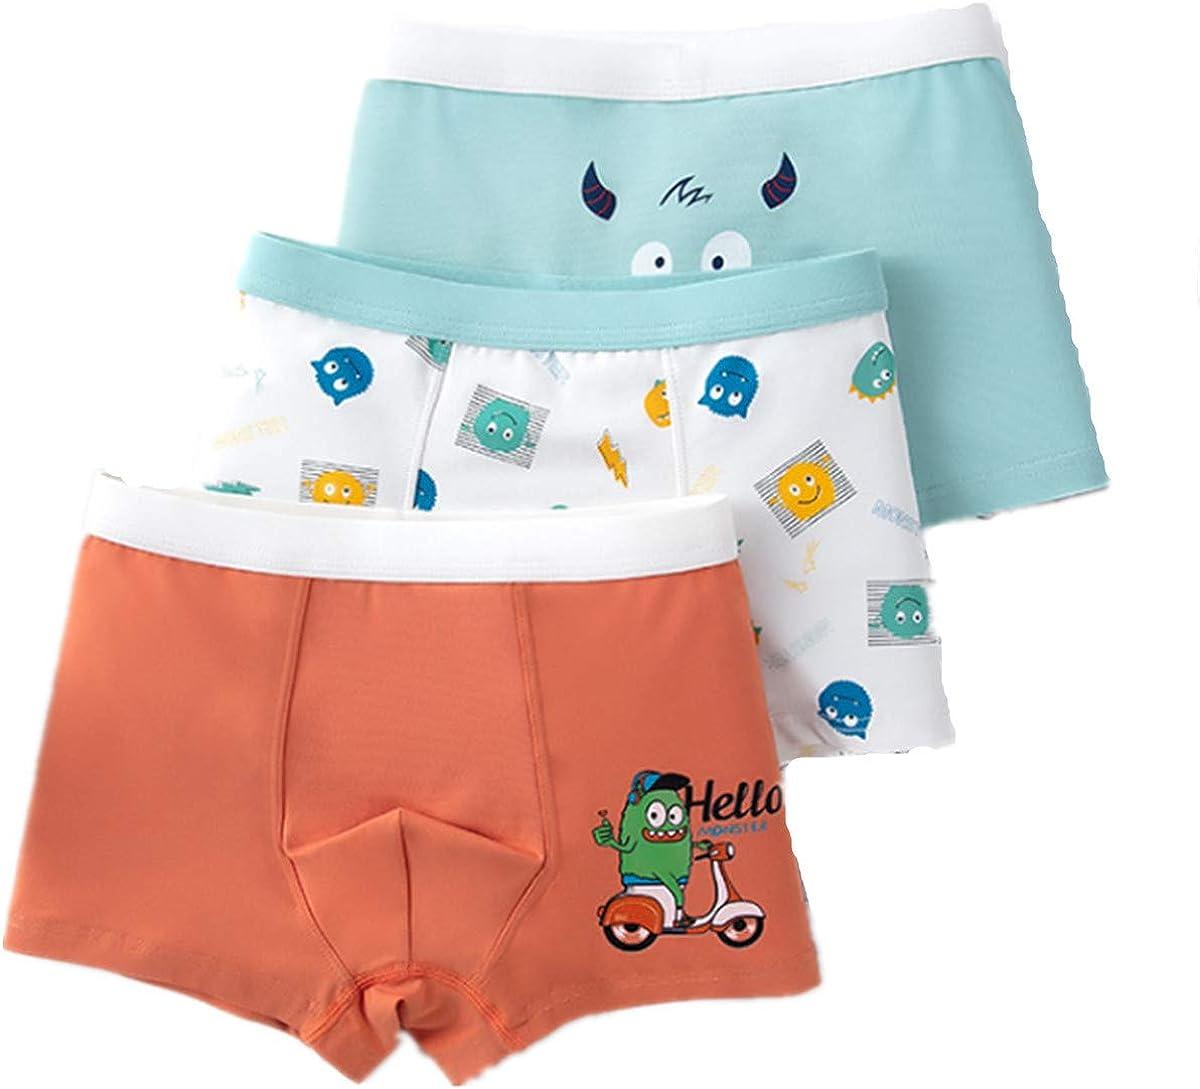 FOFJR 3 Pack Boys Boxer Briefs Shorts Cotton Toddler Underwear for 2-15Y